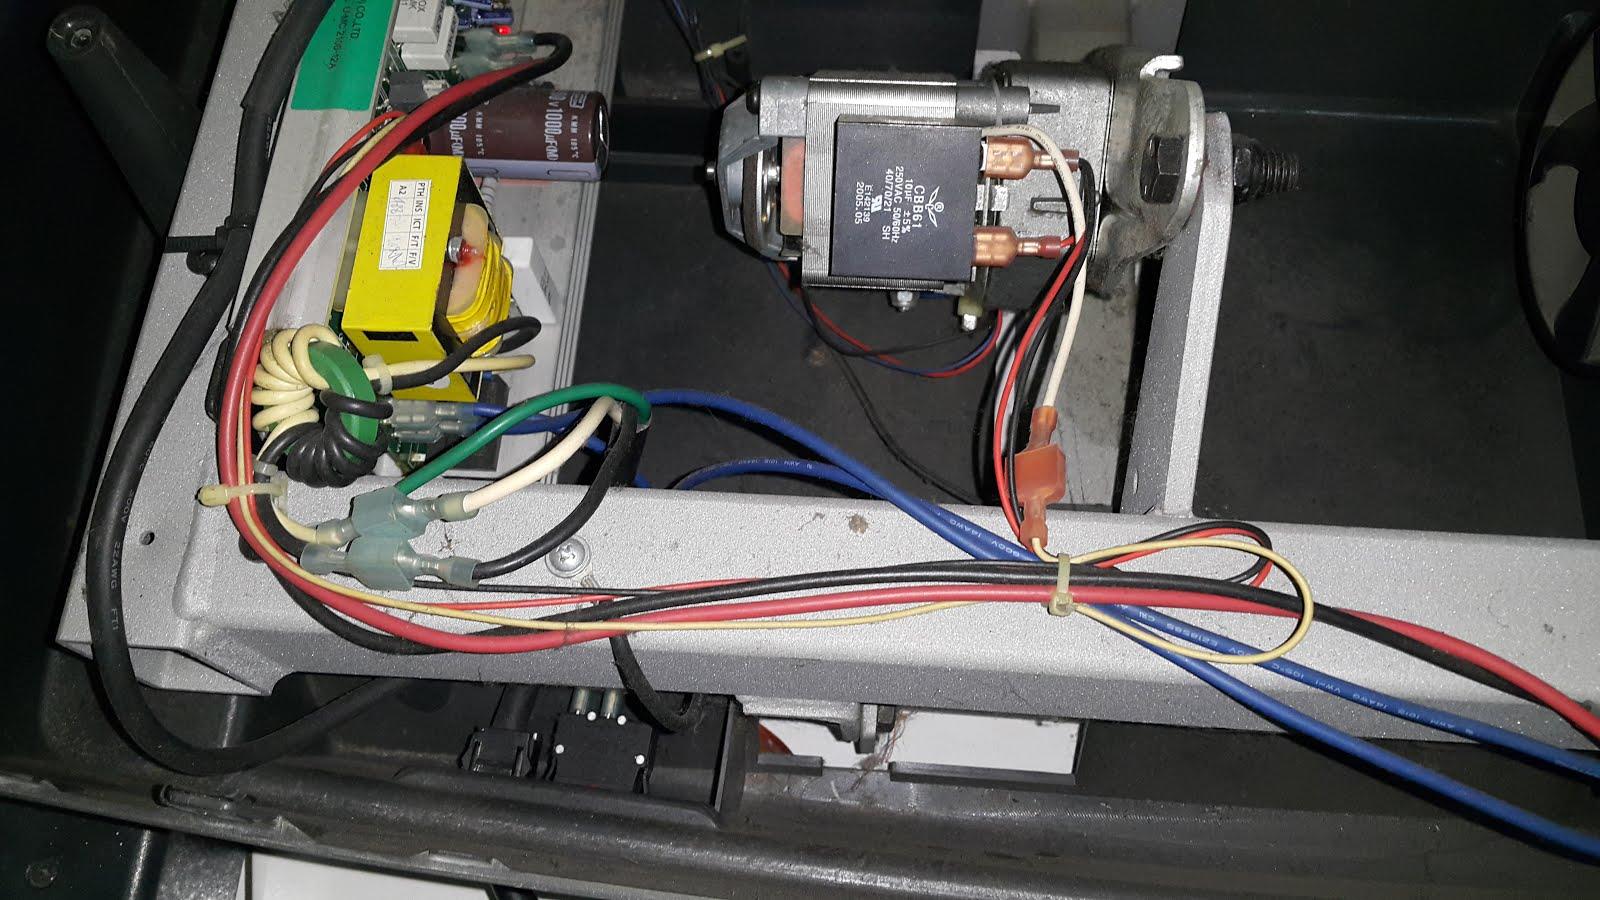 Electronics Repair Center Treadmill Incline Motor